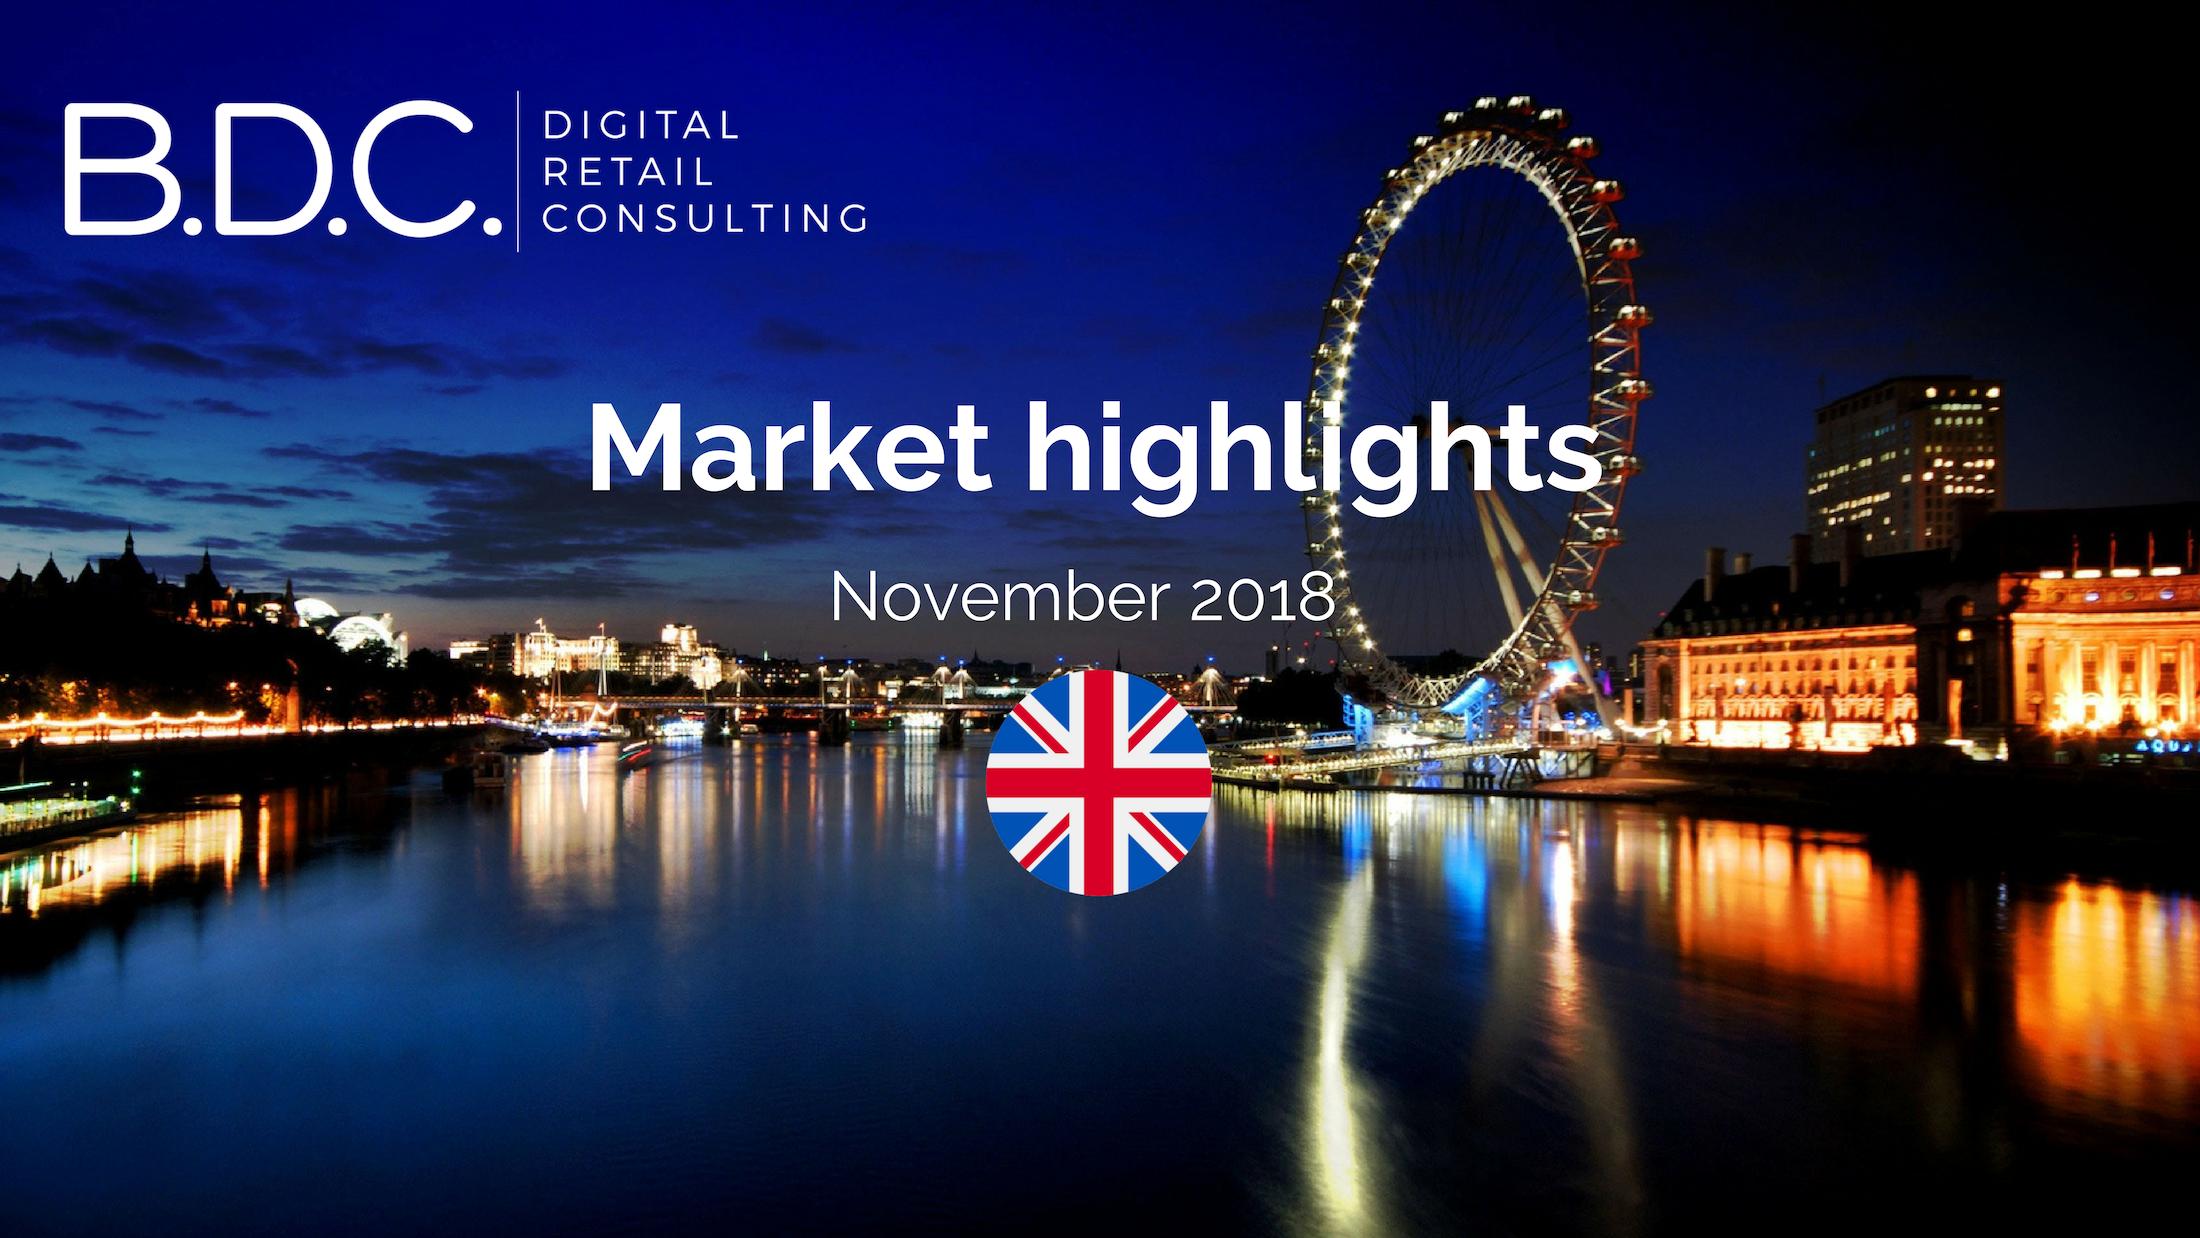 Trends News 16 - UK MARKET HIGHLIGHTS – NOVEMBER 2018